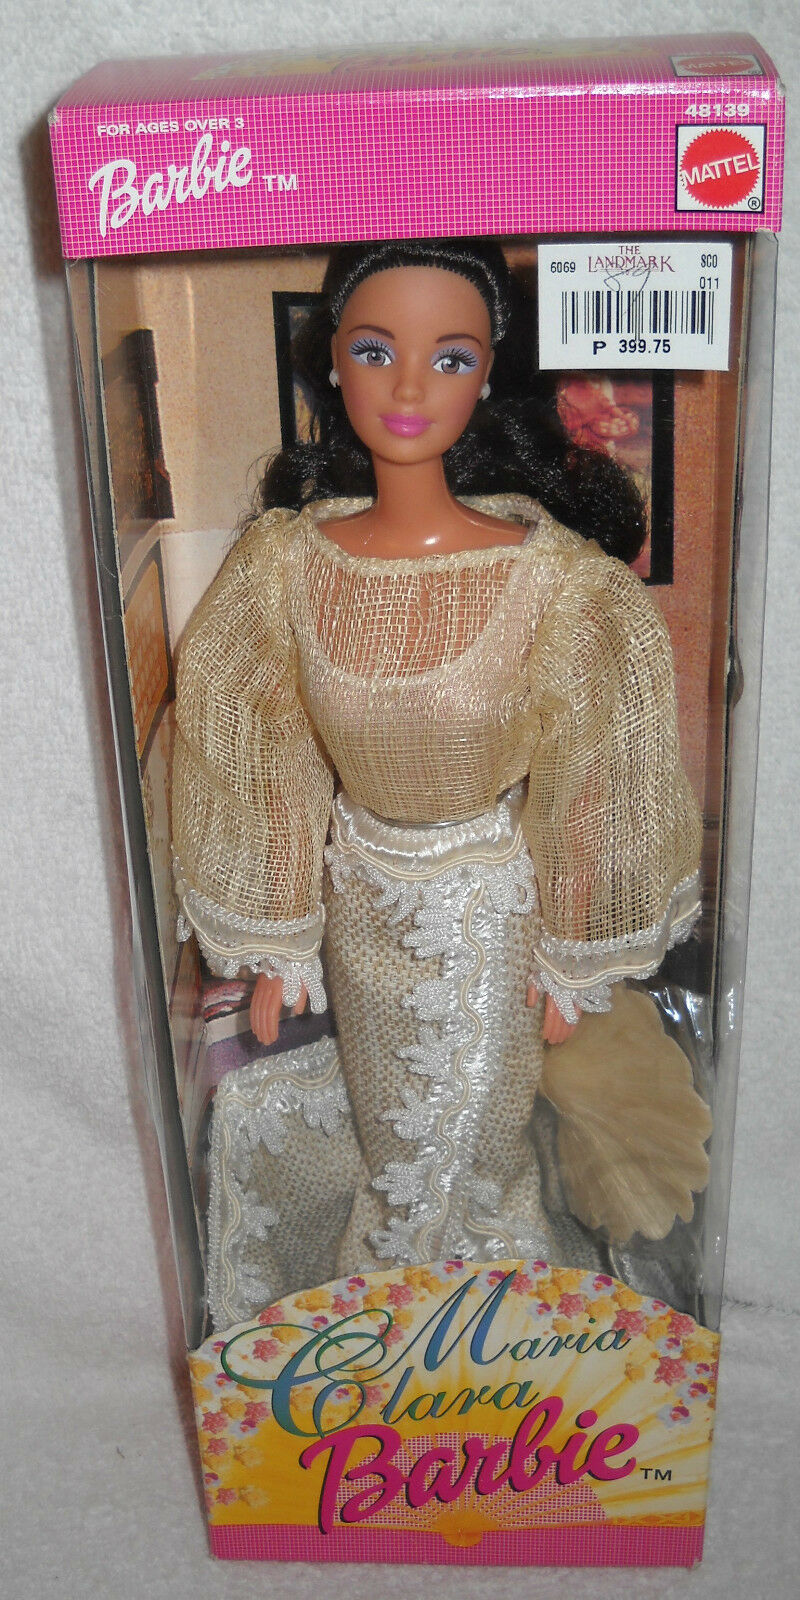 Nunca quitado de la Caja Mattel Filipinas Maria Clara Barbie tema extranjeros